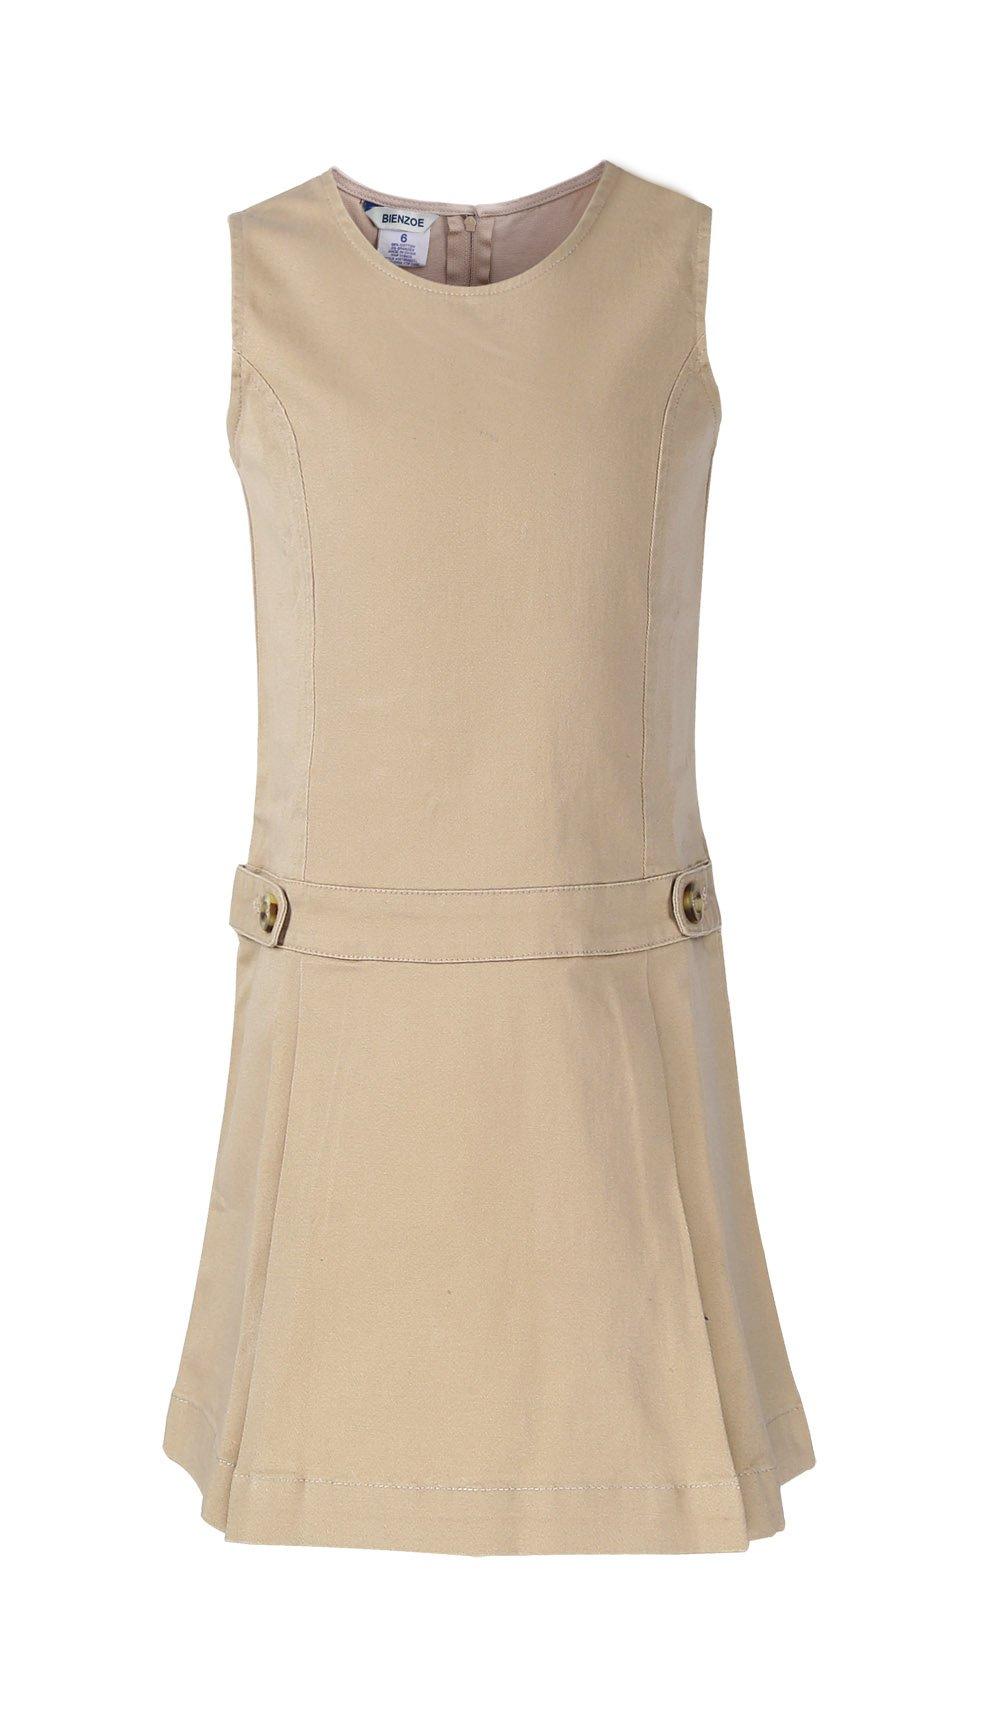 Bienzoe Girls Cotton Stretchy Twill Jumper School Uniforms Button Dress